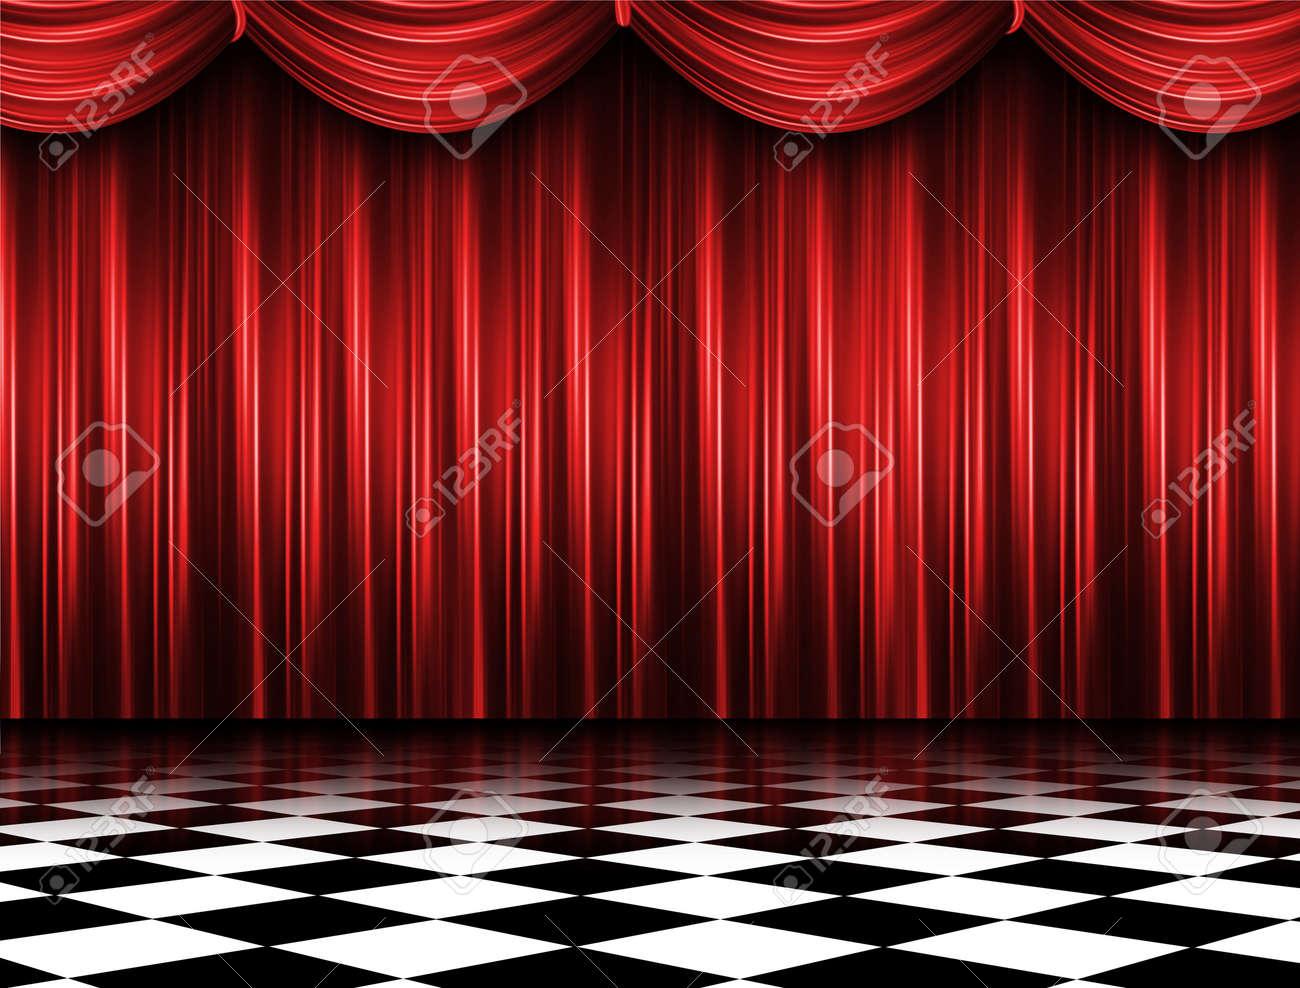 Red curtain spotlight - Red Curtain Stock Photo 11004087